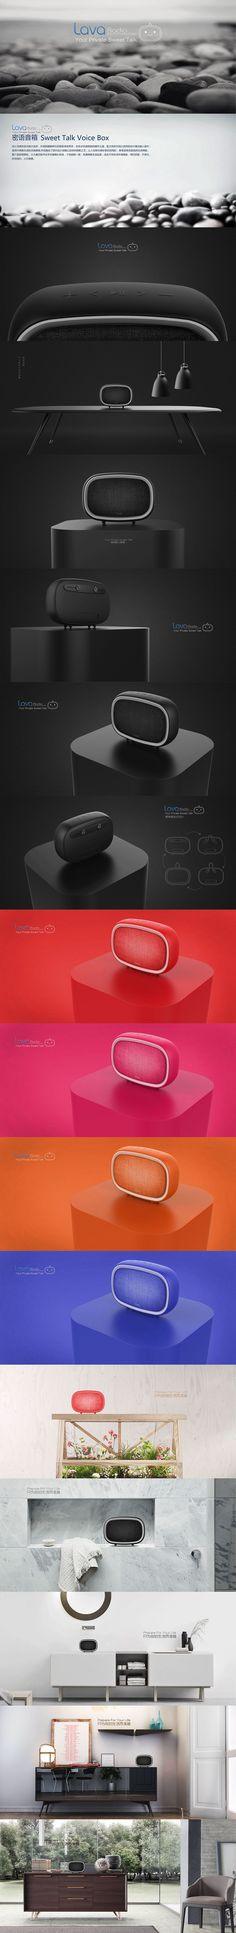 Lavaradio音箱- Personal Original Design on Behance